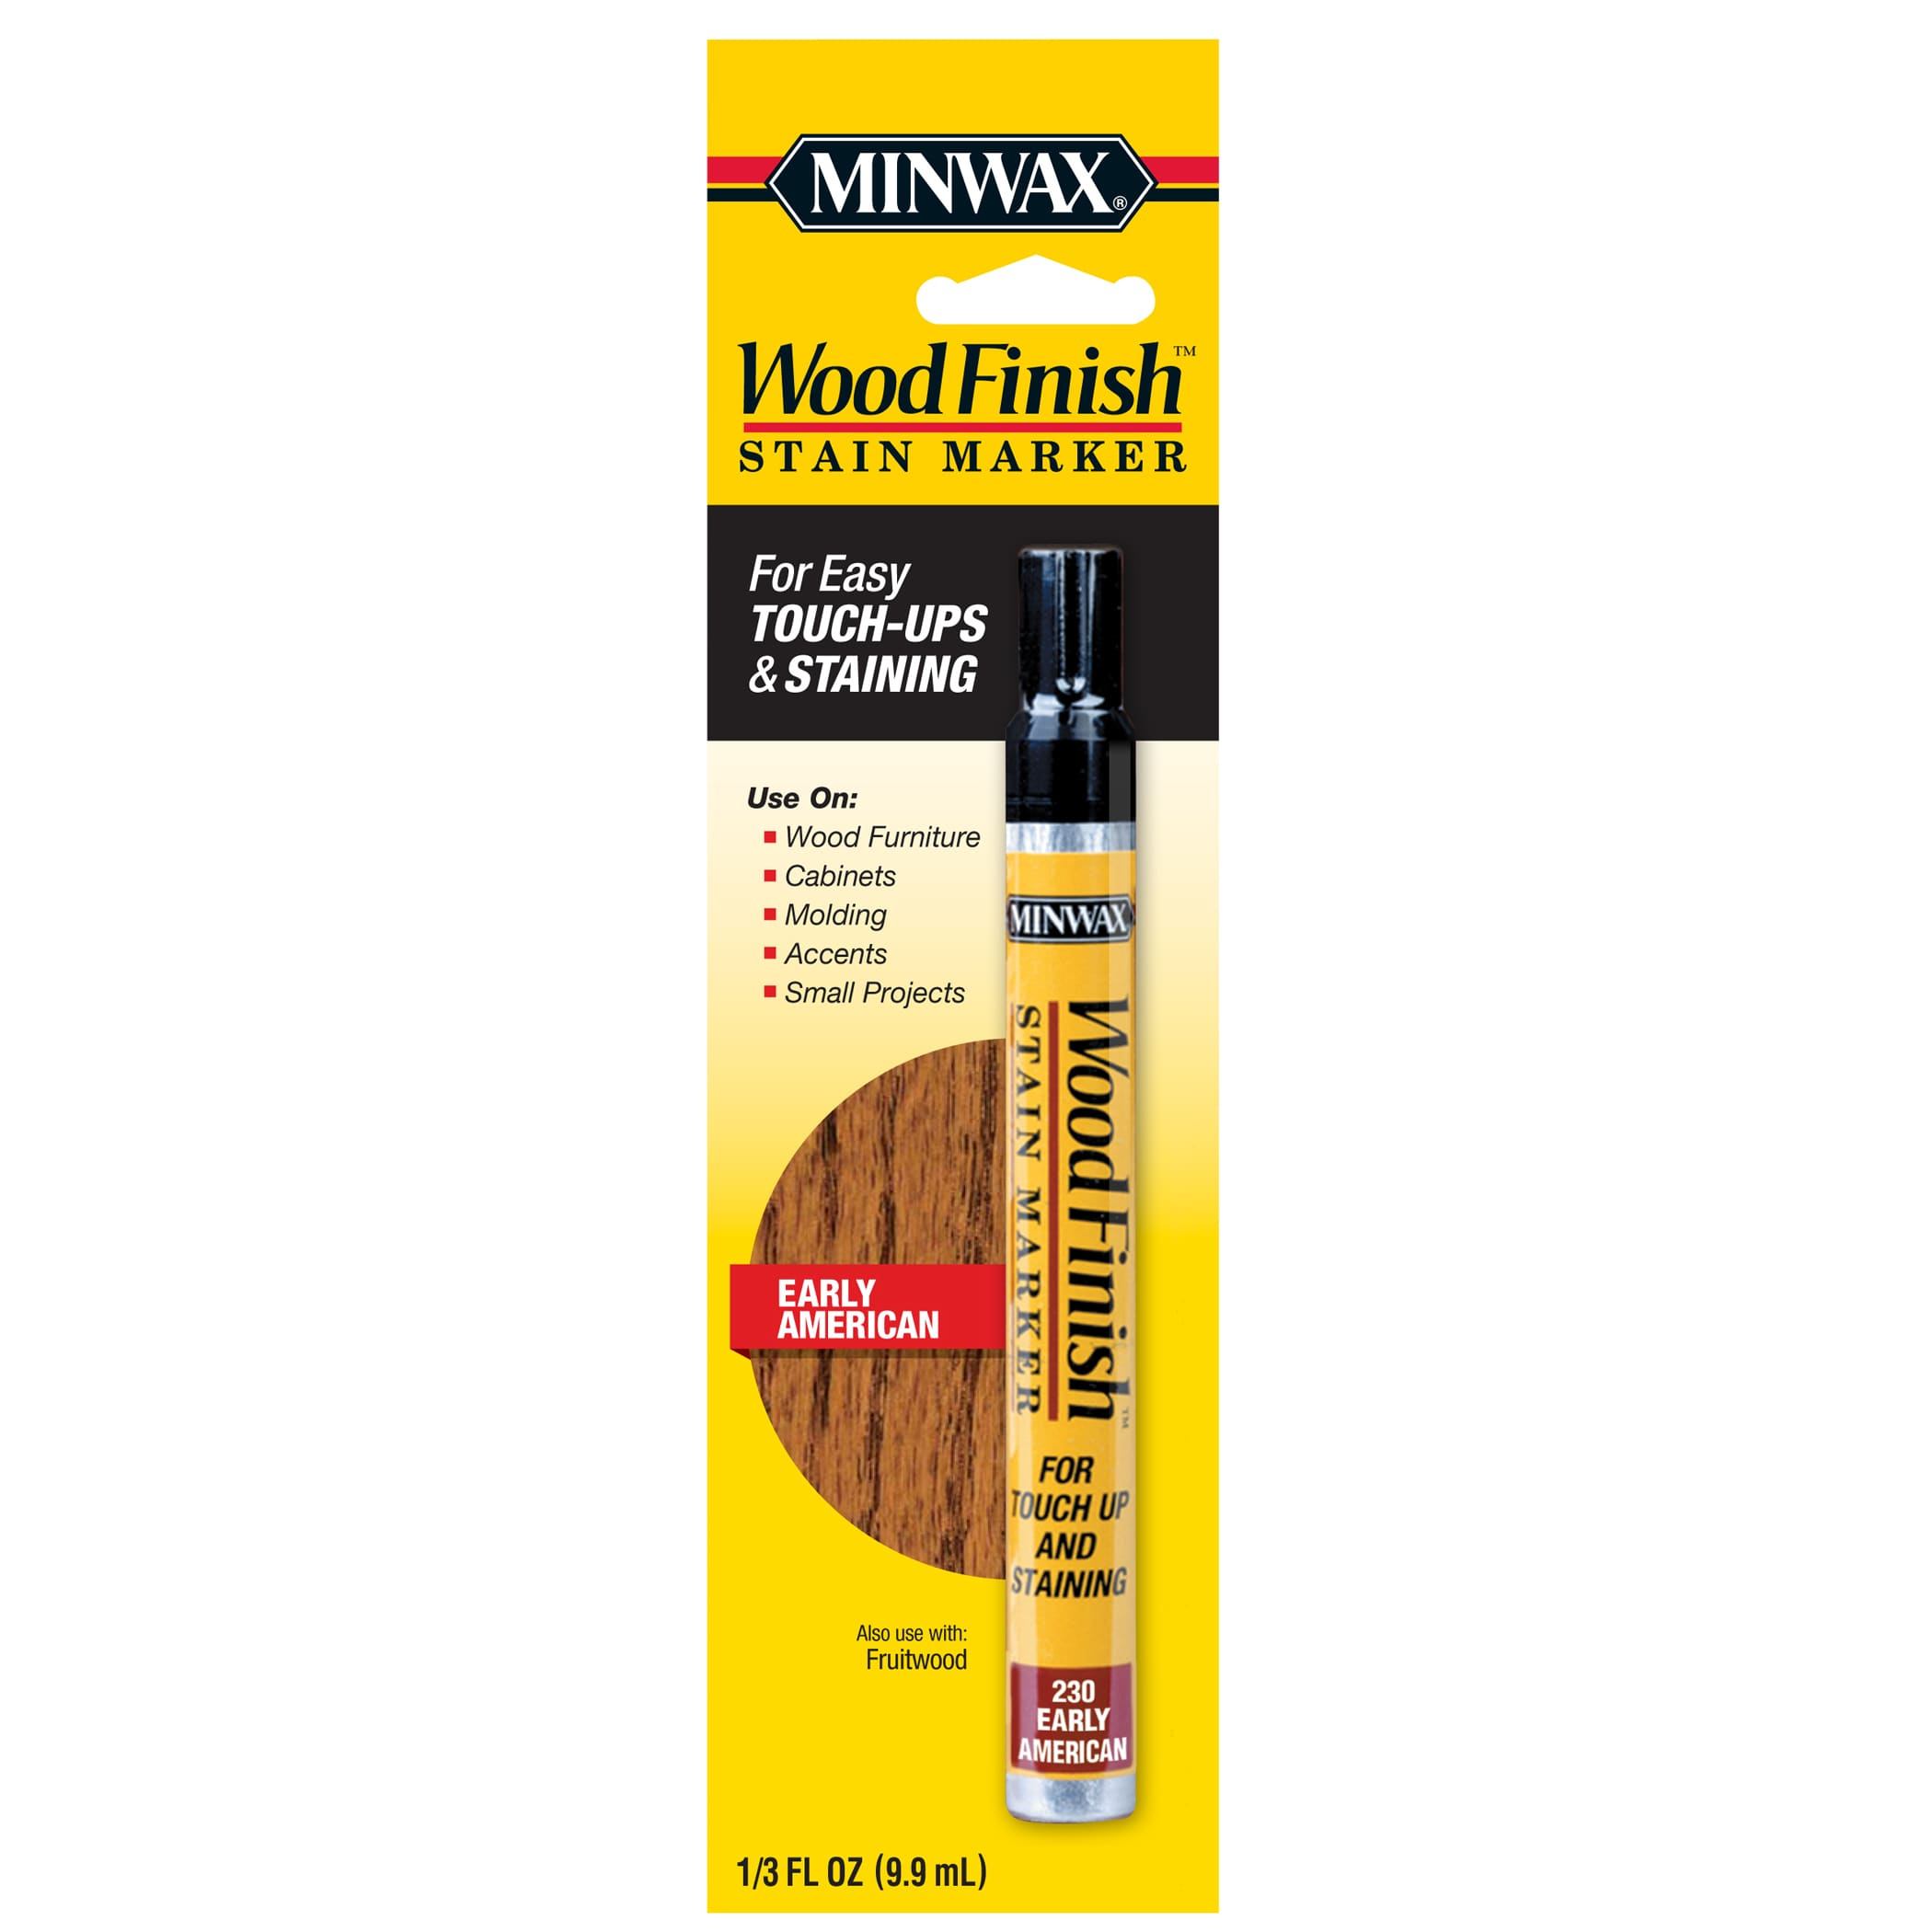 Minwax Wood Finish Stain Marker 13 Oz Early American Walmart